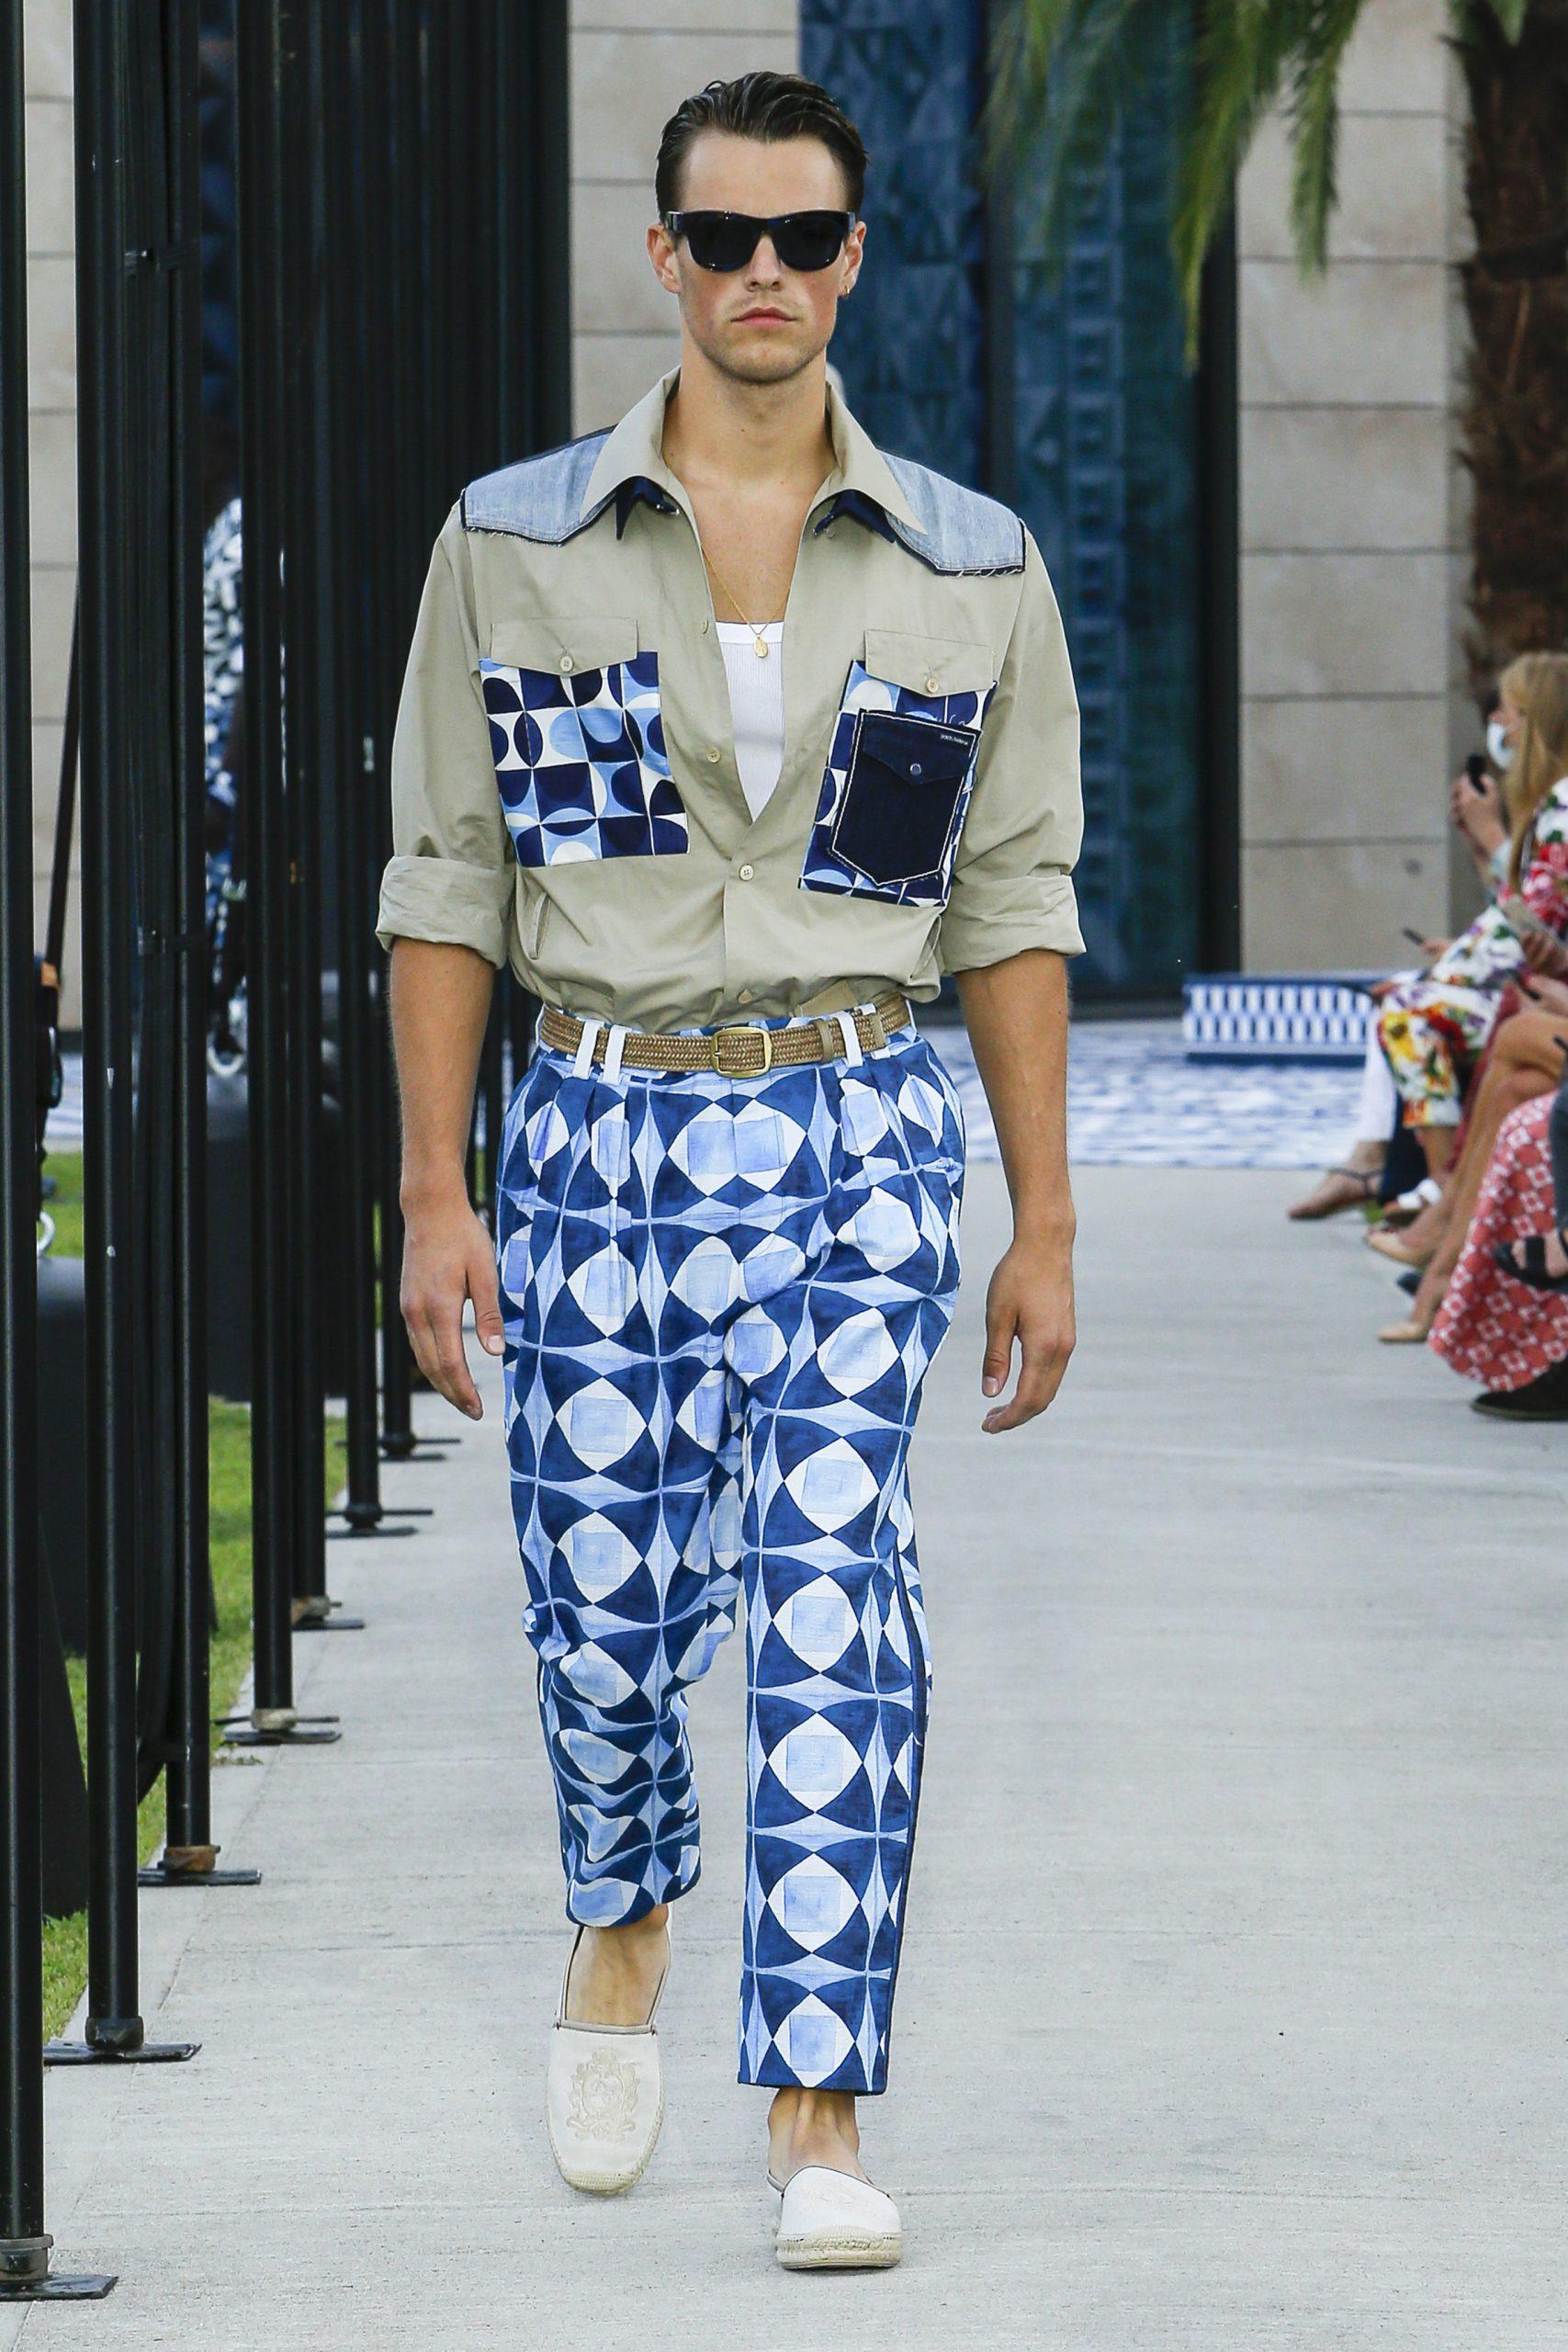 Dolce & Gabbana Spring 2021 Men's Fashion Show Review